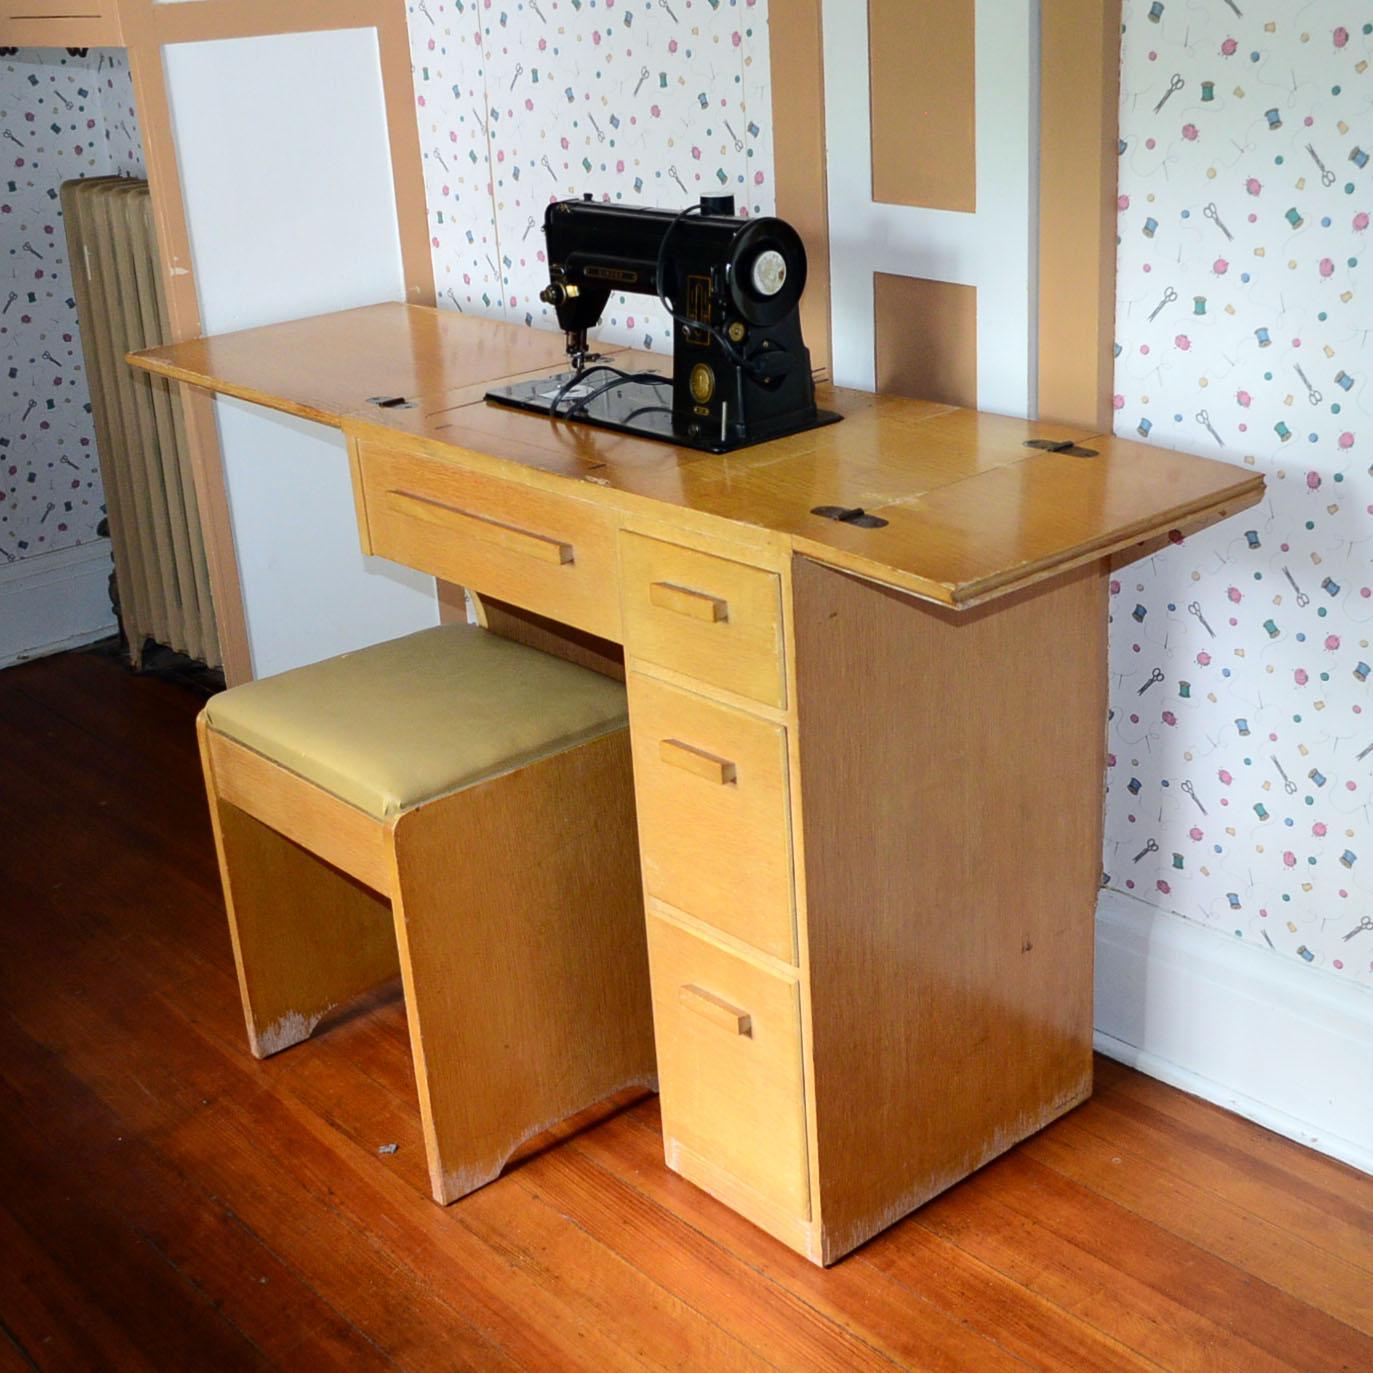 Vintage Singer 301 Sewing Machine & Vintage Cabinet : EBTH